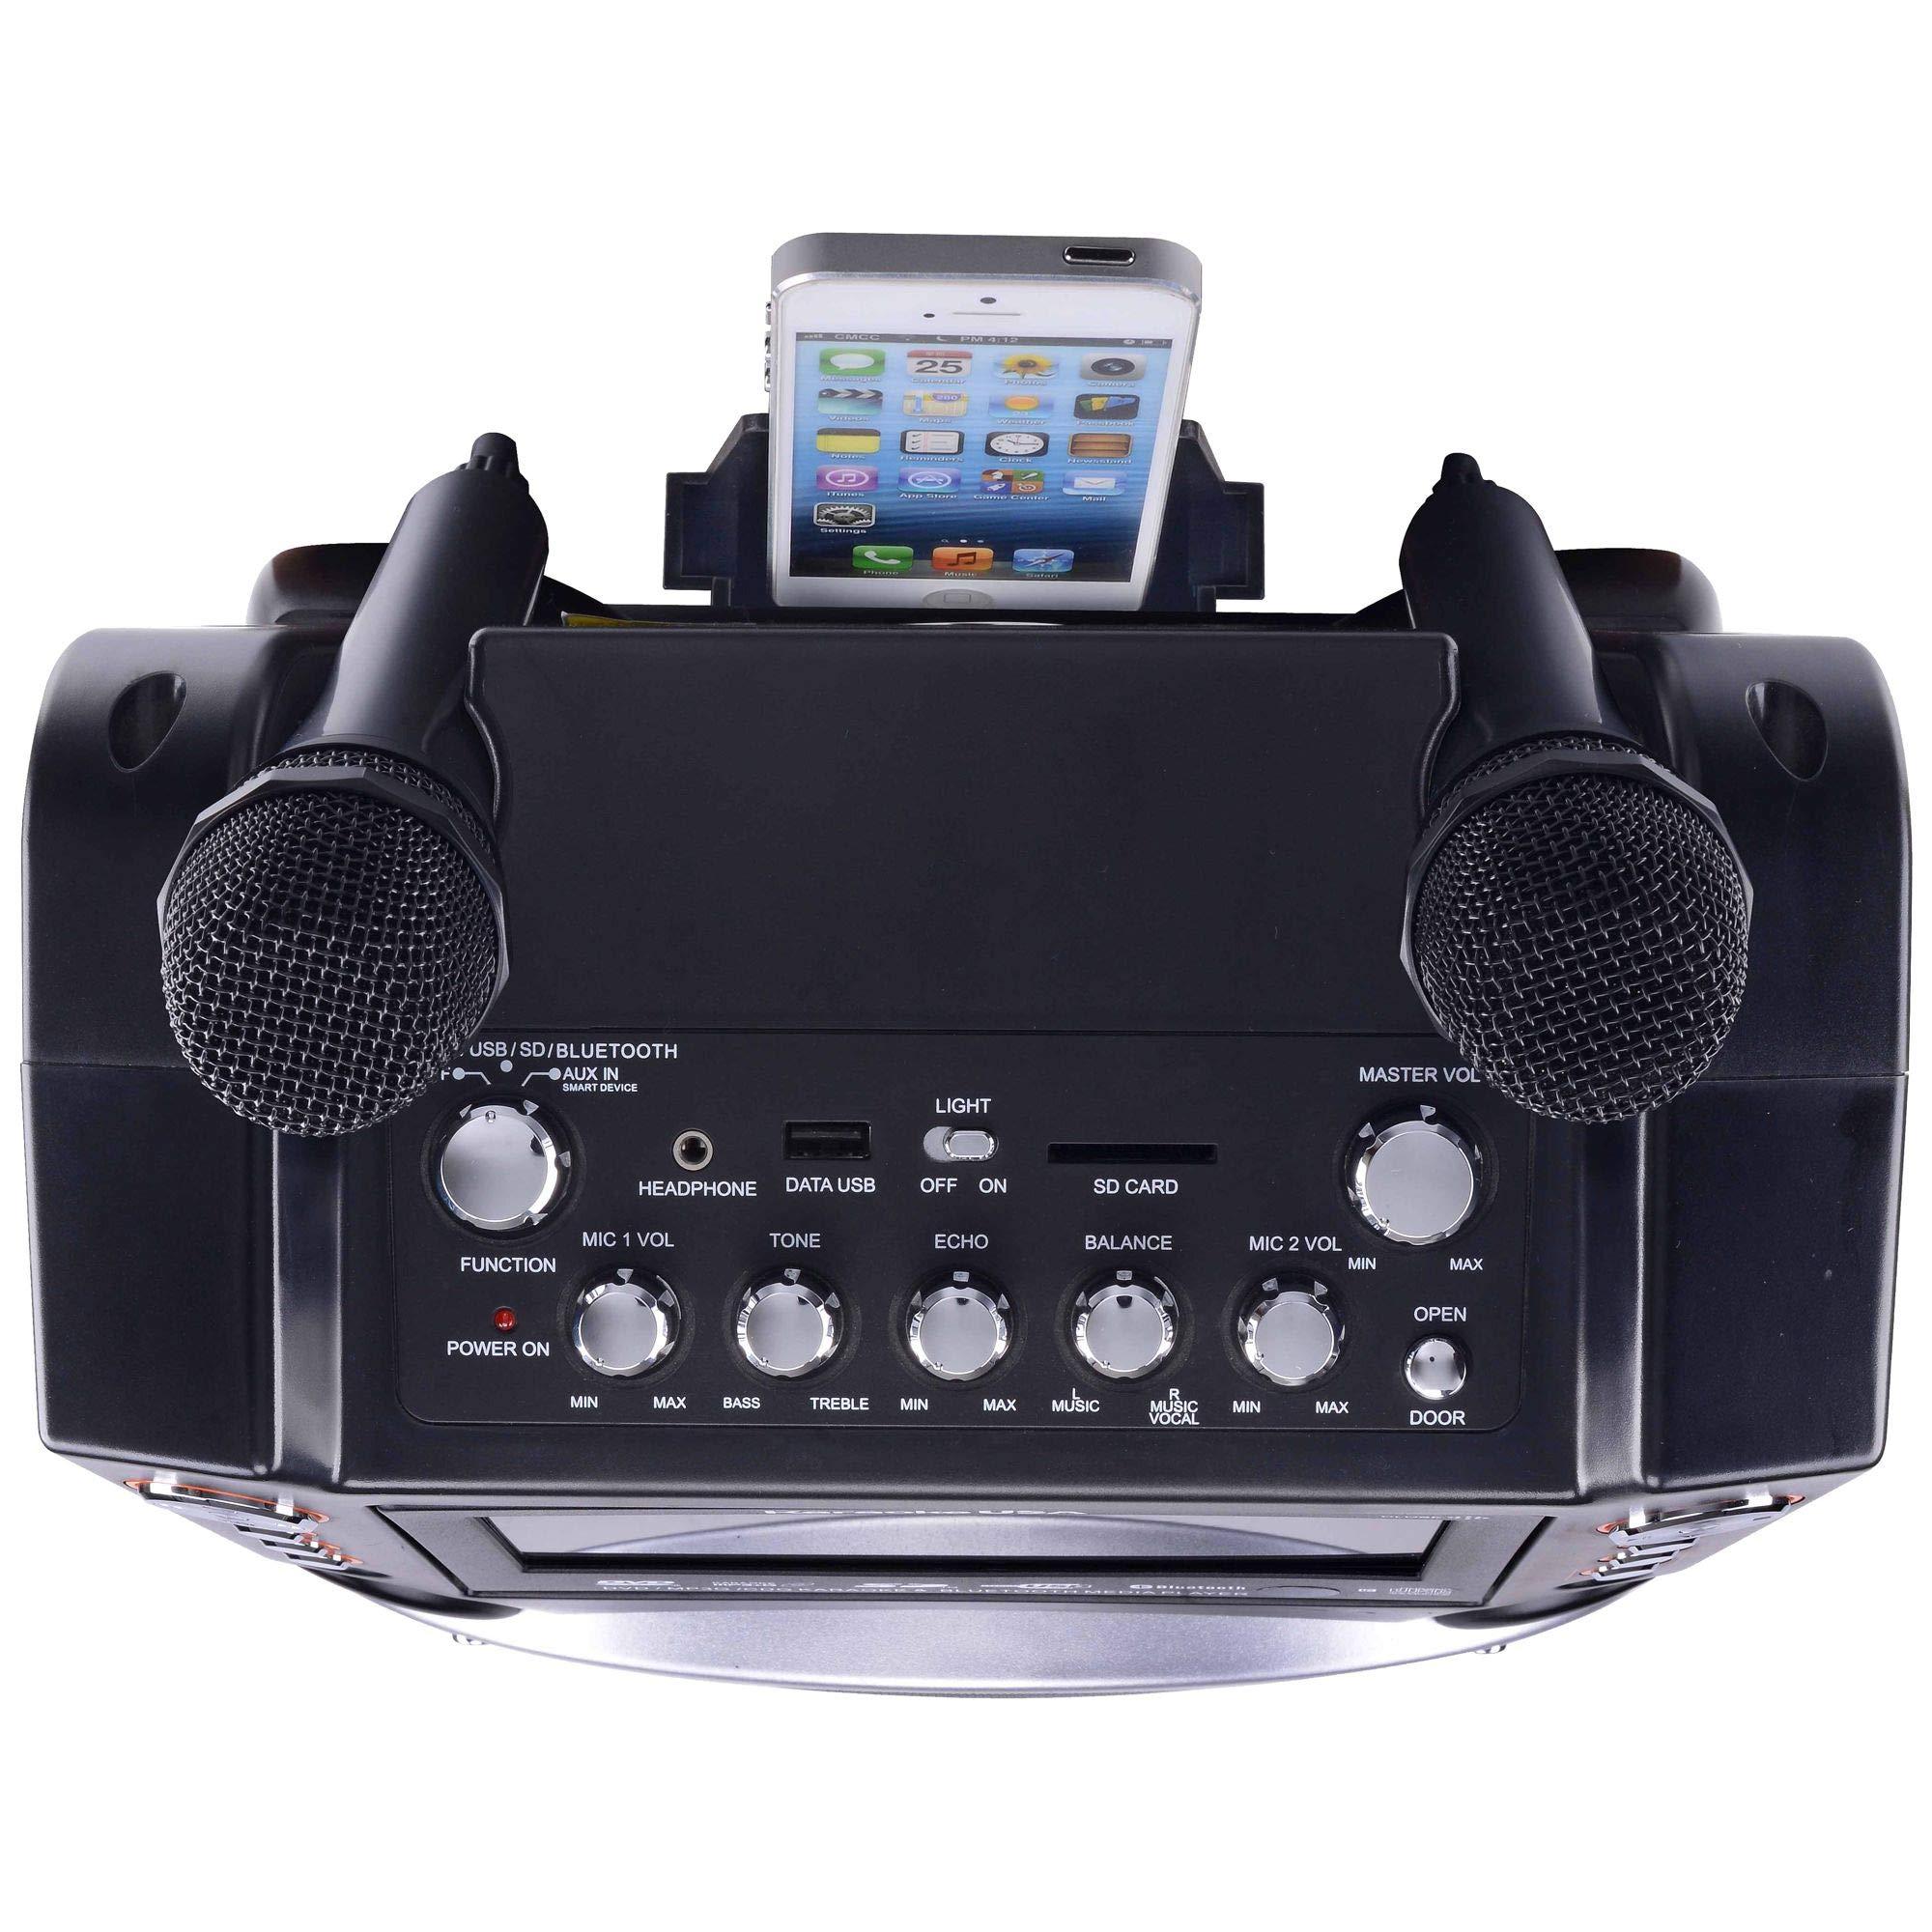 Karaoke USA GF846 DVD/CDG/MP3G Karaoke Machine with 7'' TFT Color Screen, Record, Bluetooth and LED Sync Lights by Karaoke USA (Image #15)